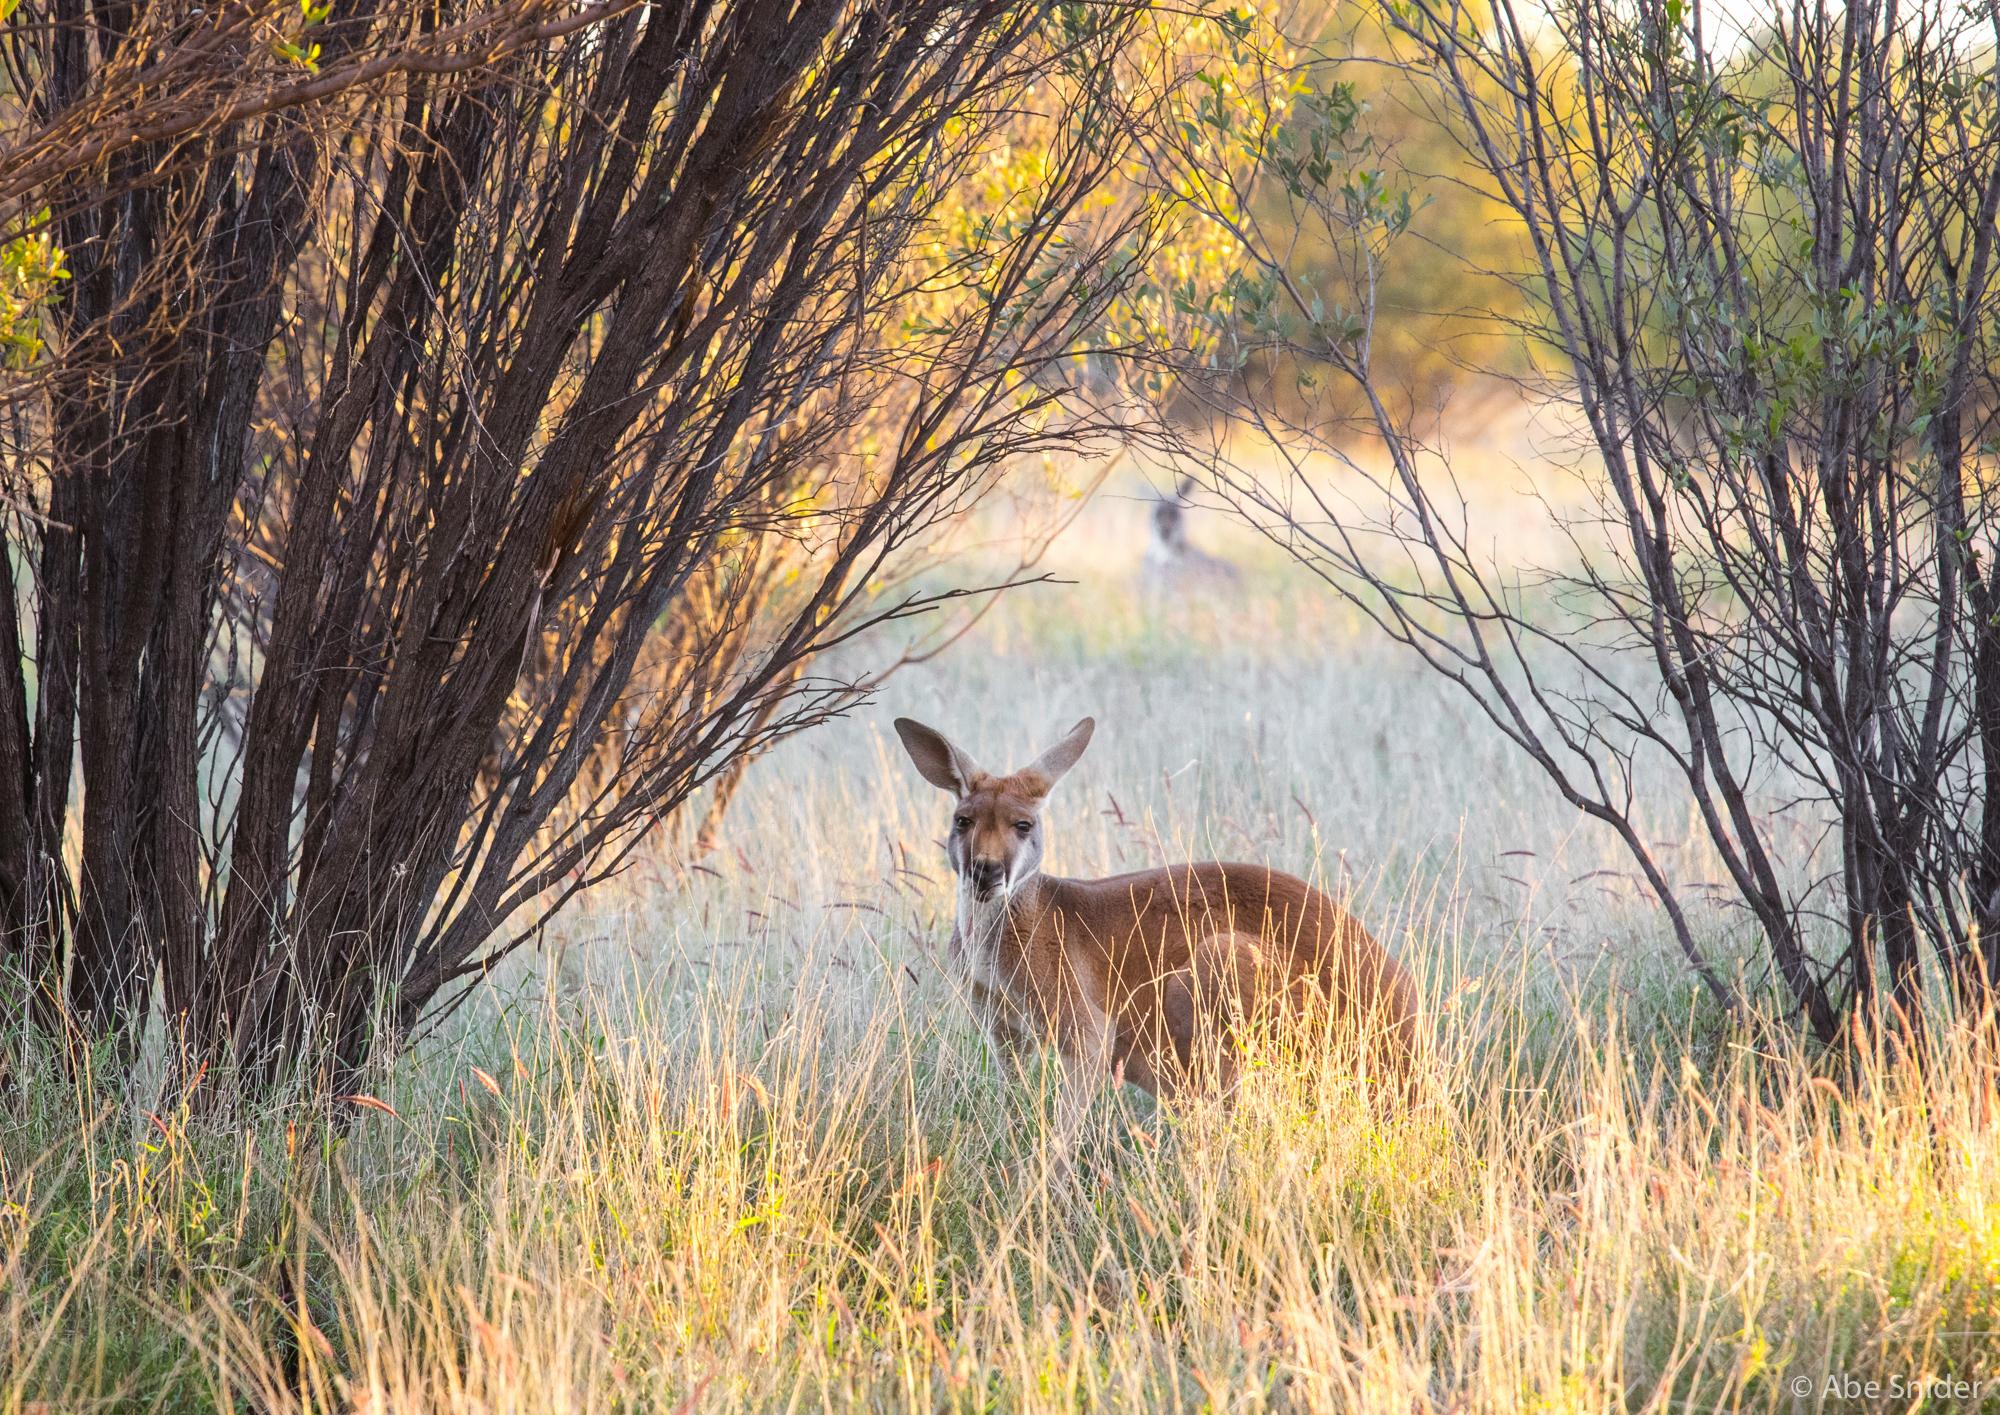 Red Kangaroo - Australia